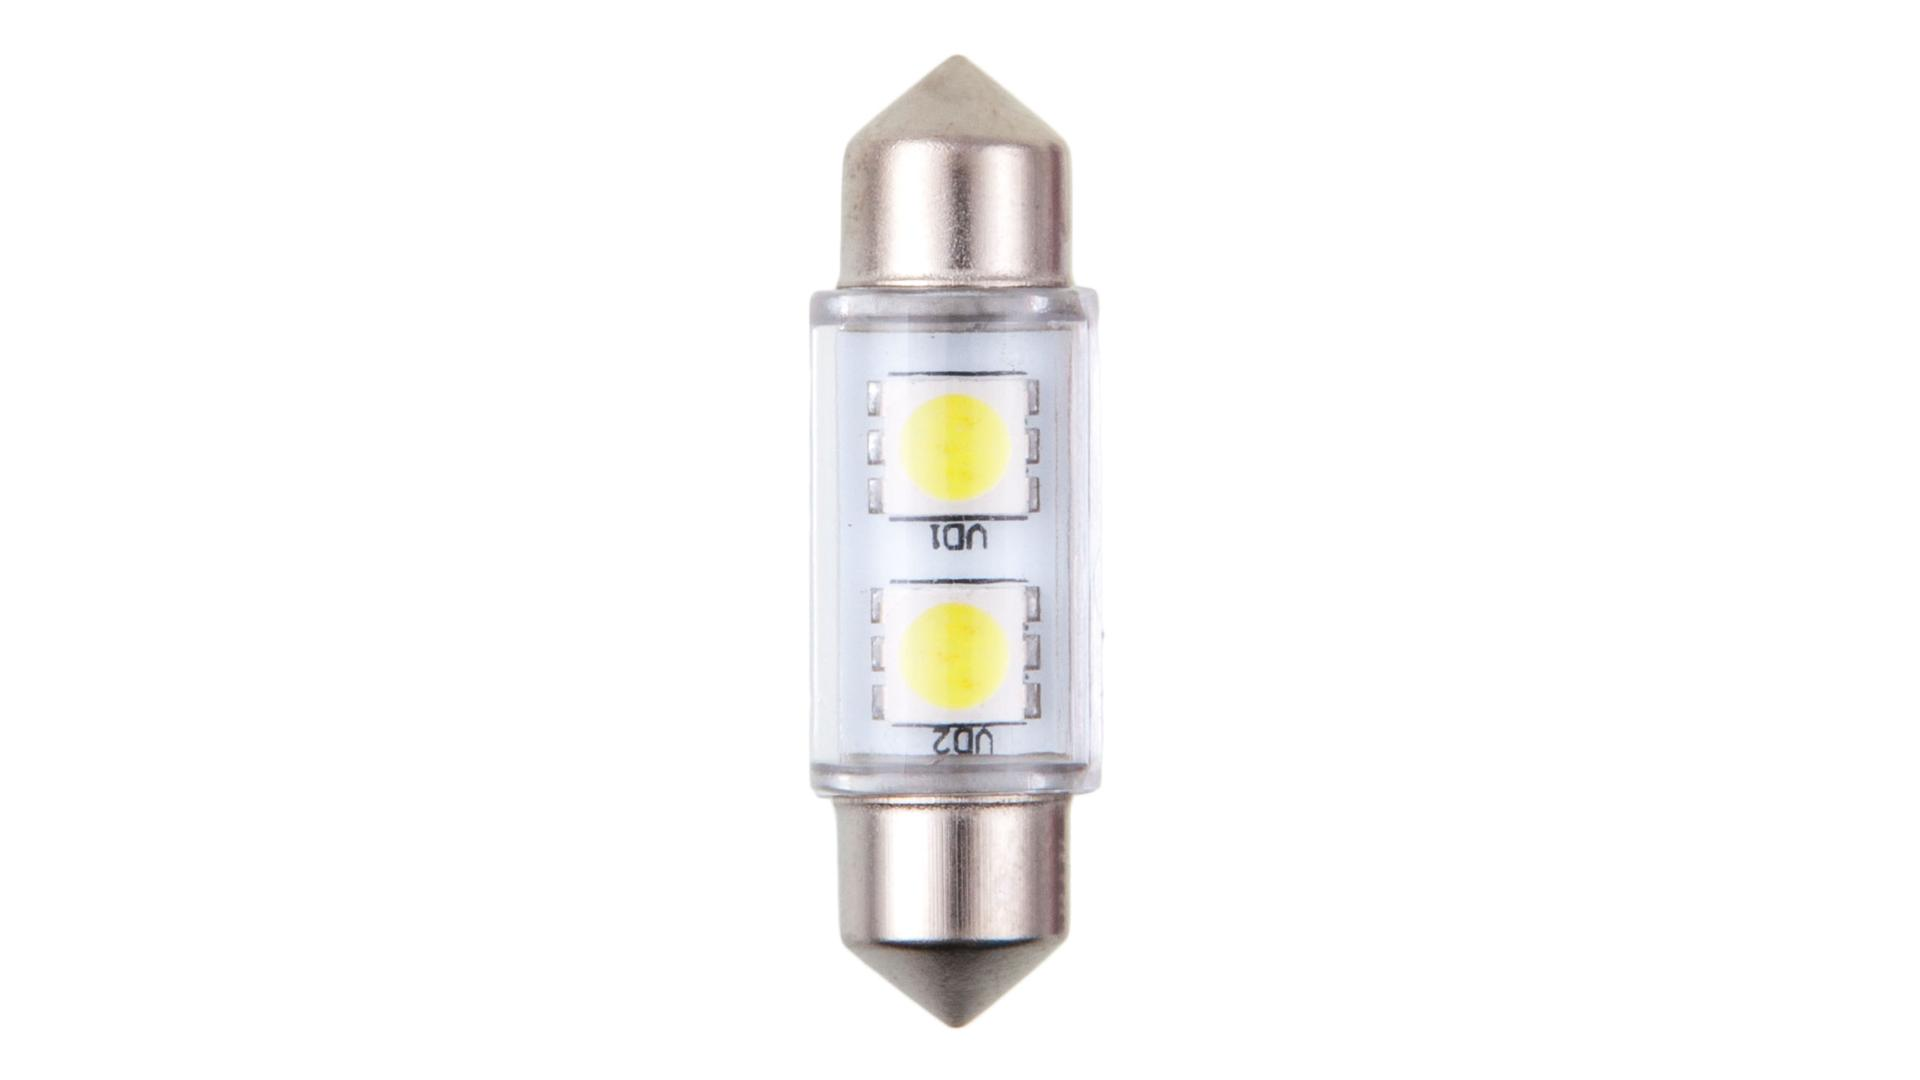 4CARS LED žárovka 2LED 12V Festoon SMD T11x36mm